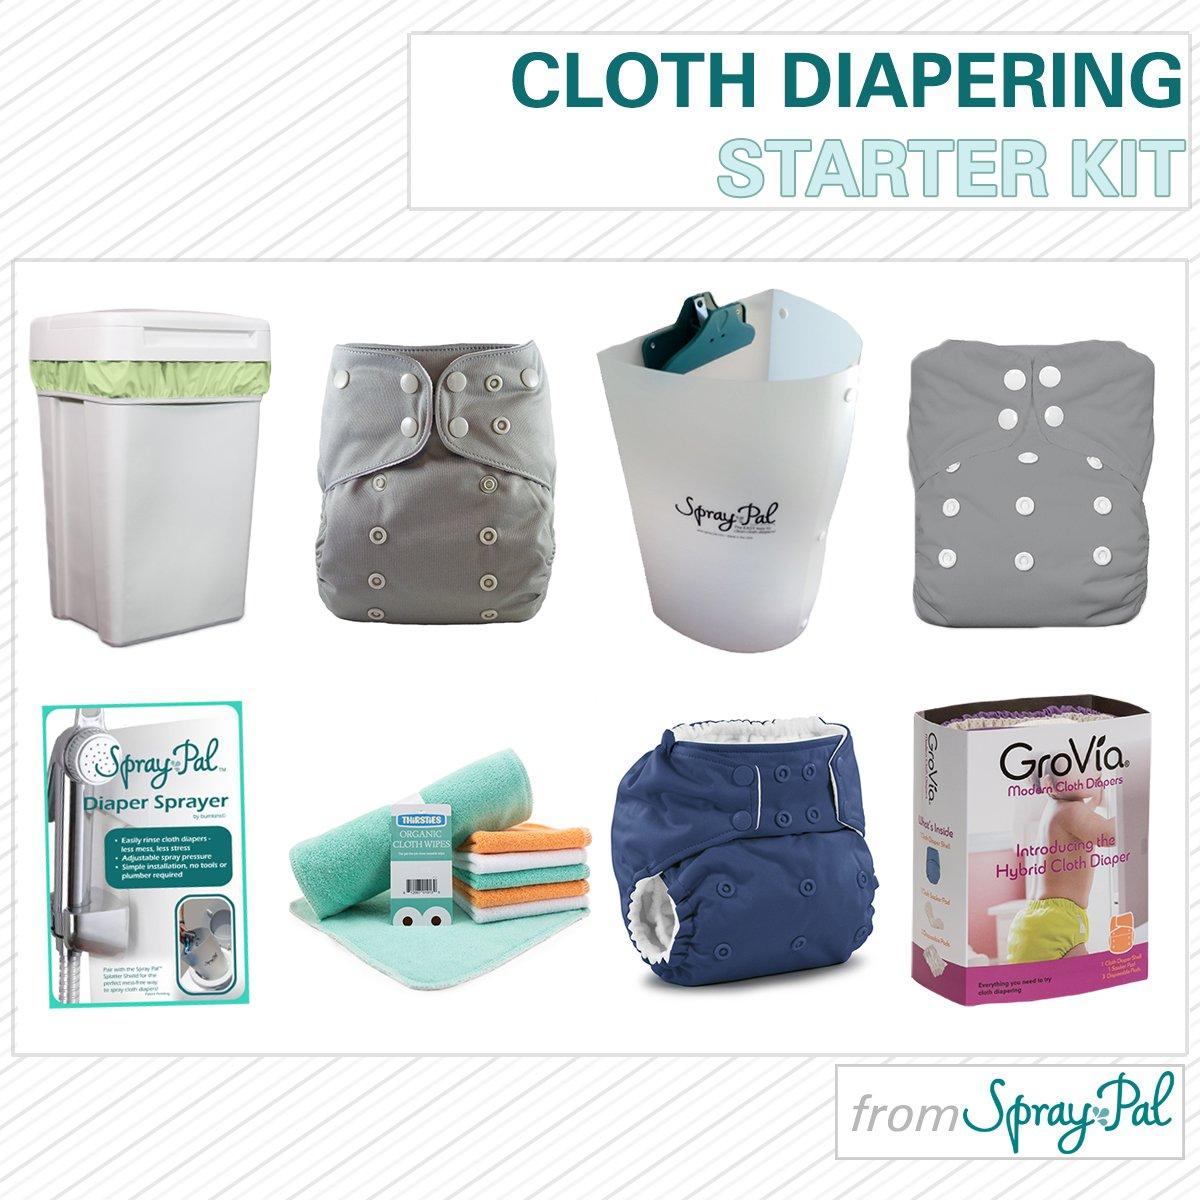 Spray Pal's Cloth Diapering Starter Kit